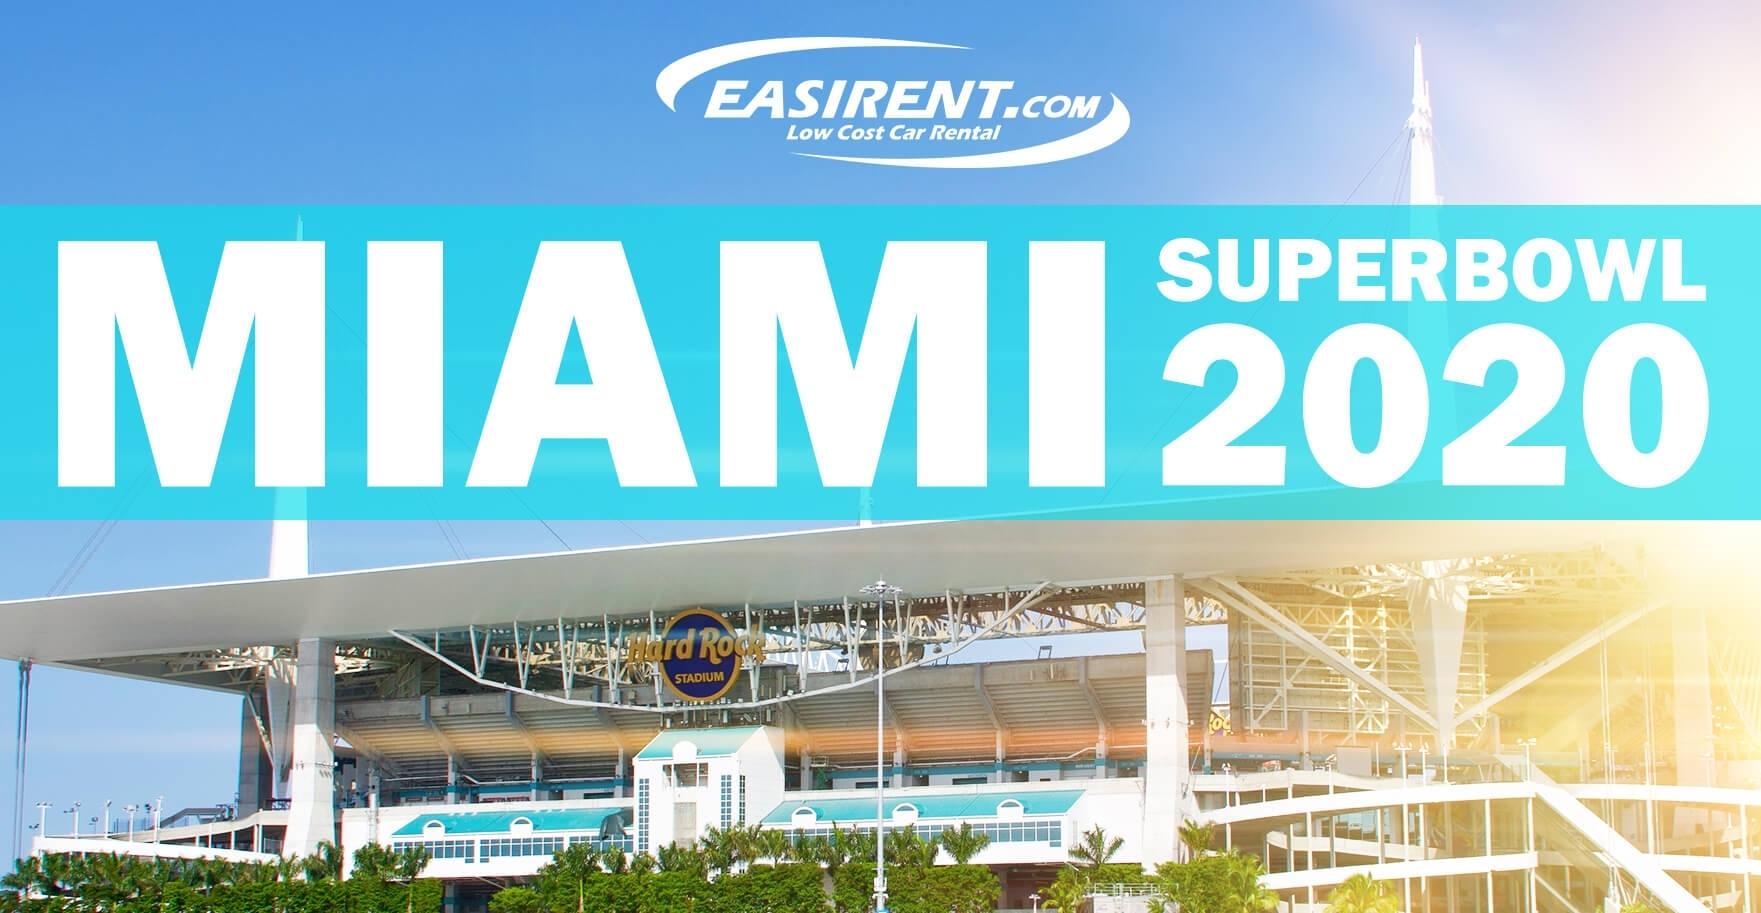 Super Bowl Miami Gardens Tickets 2020 - Easirent Us with regard to Miami Gardens Super Bowl